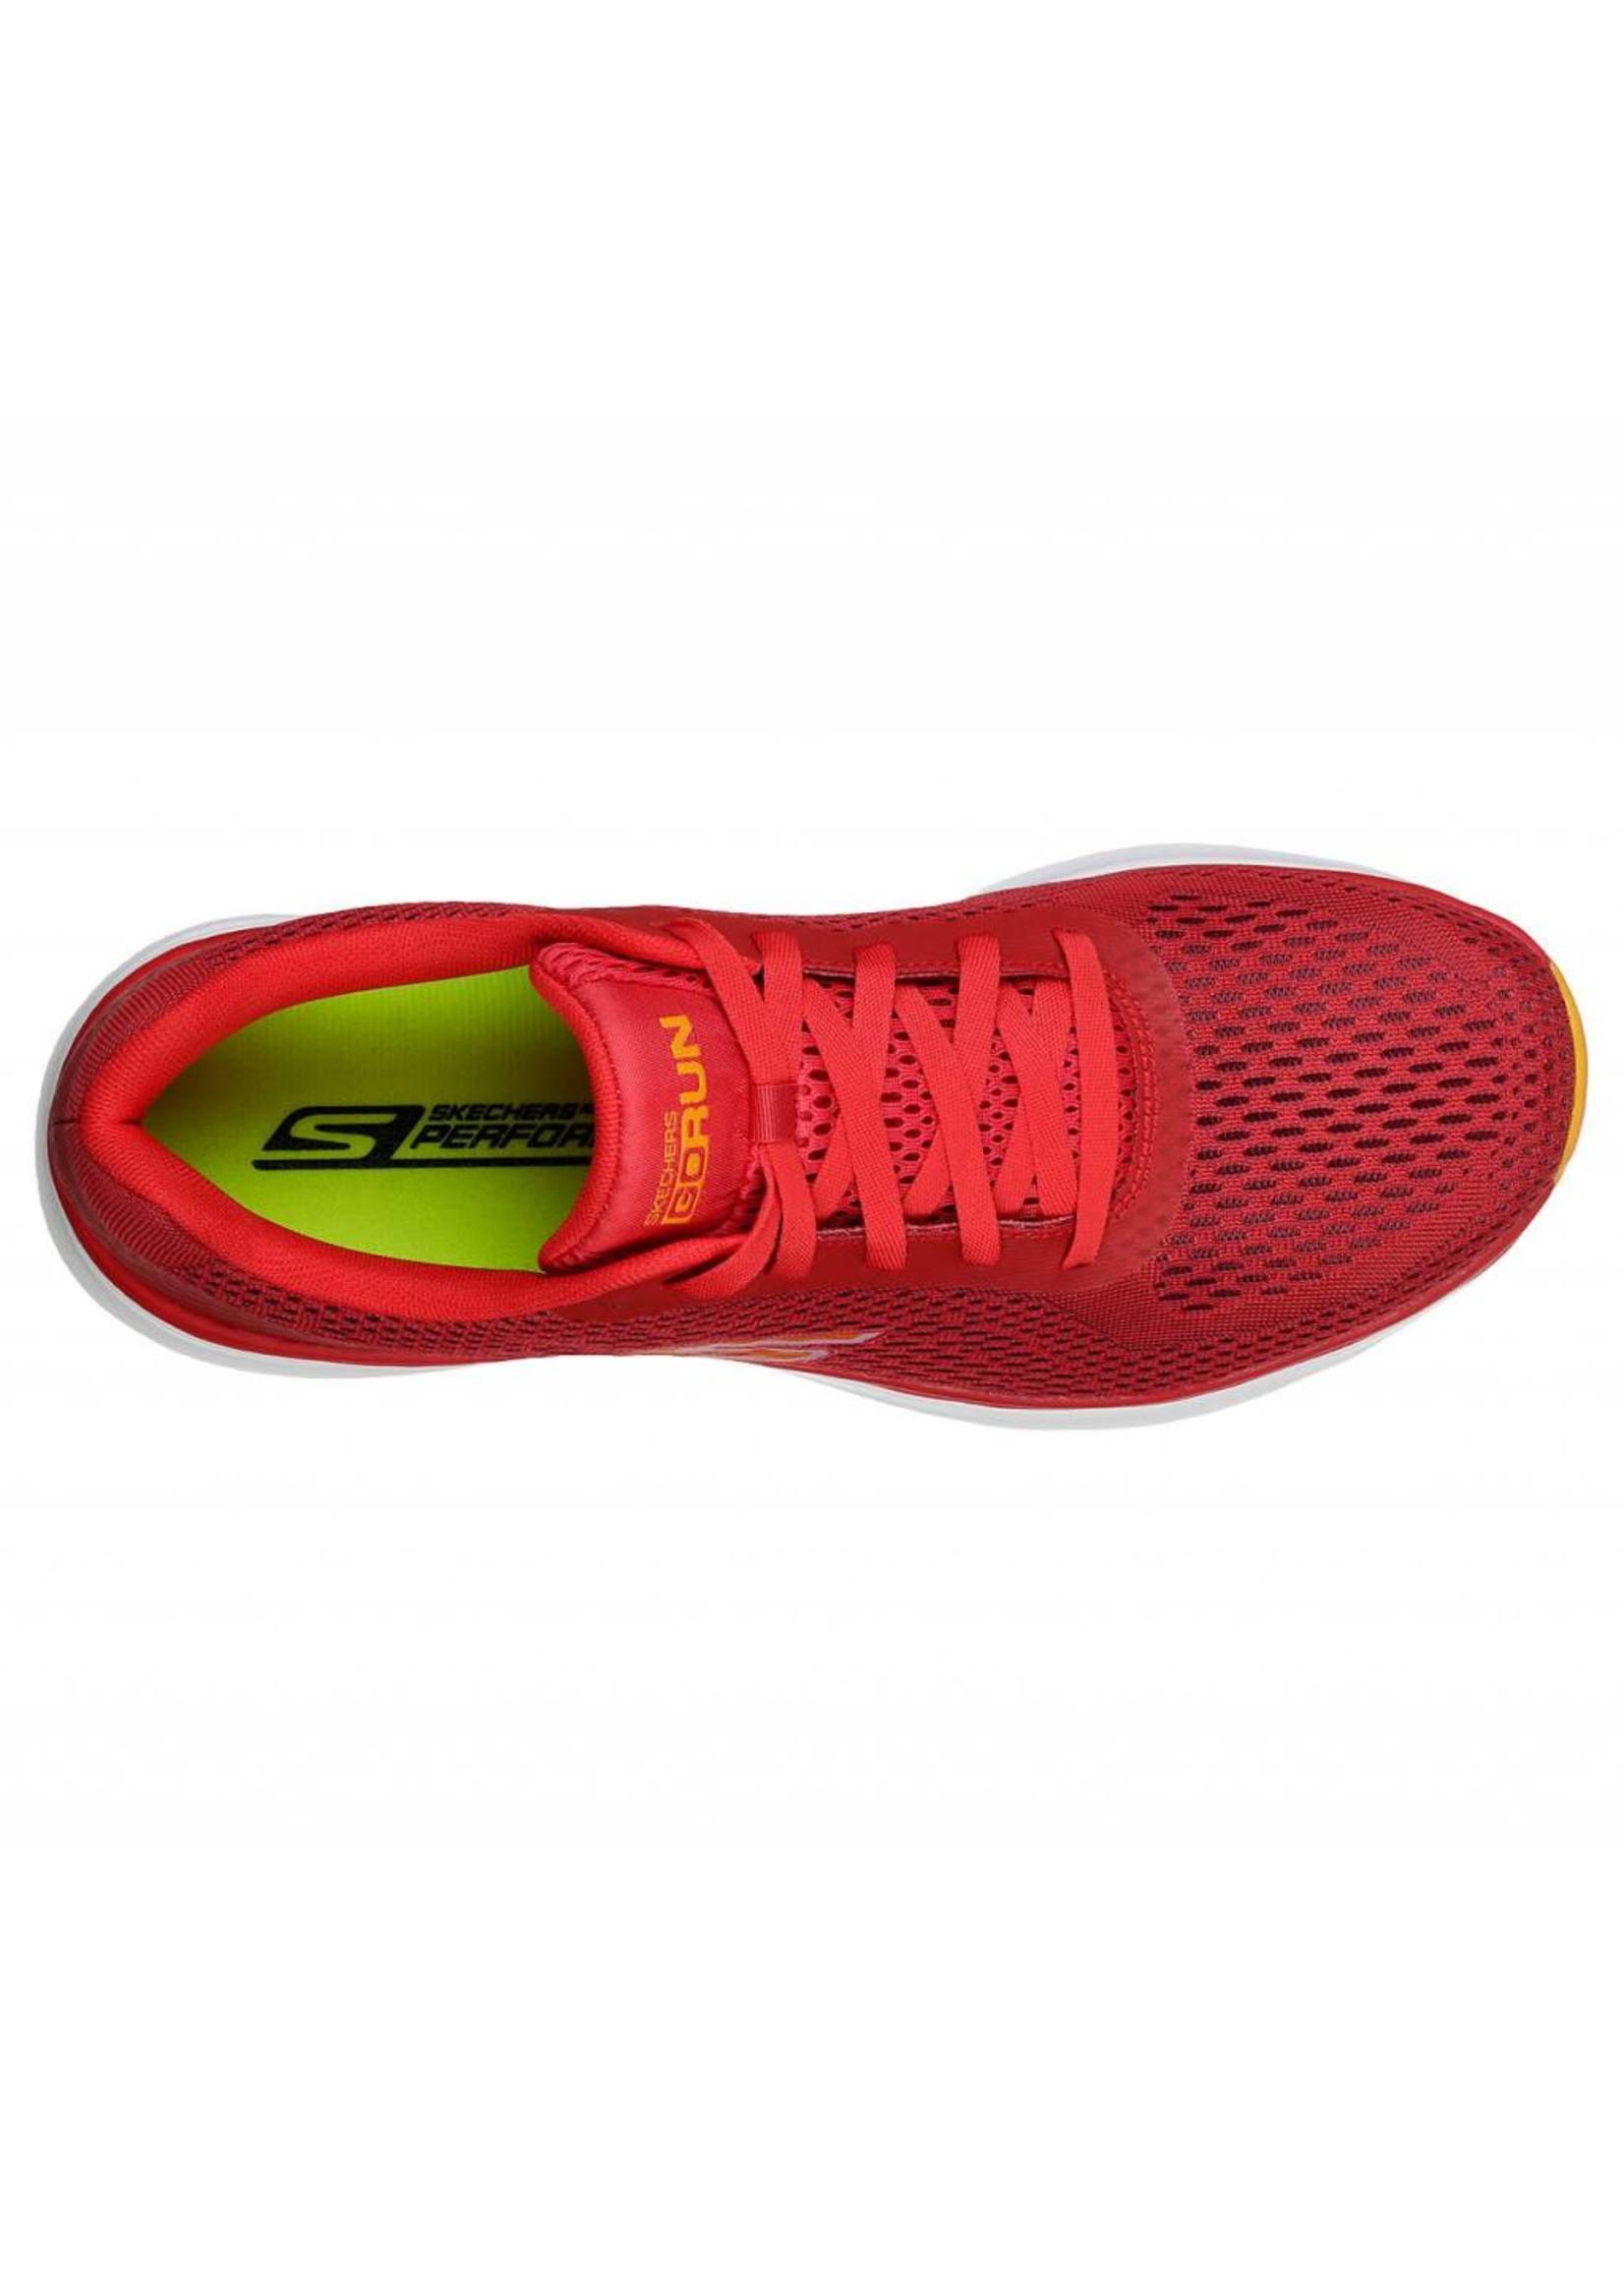 Skechers GO RUN - PURE 55216